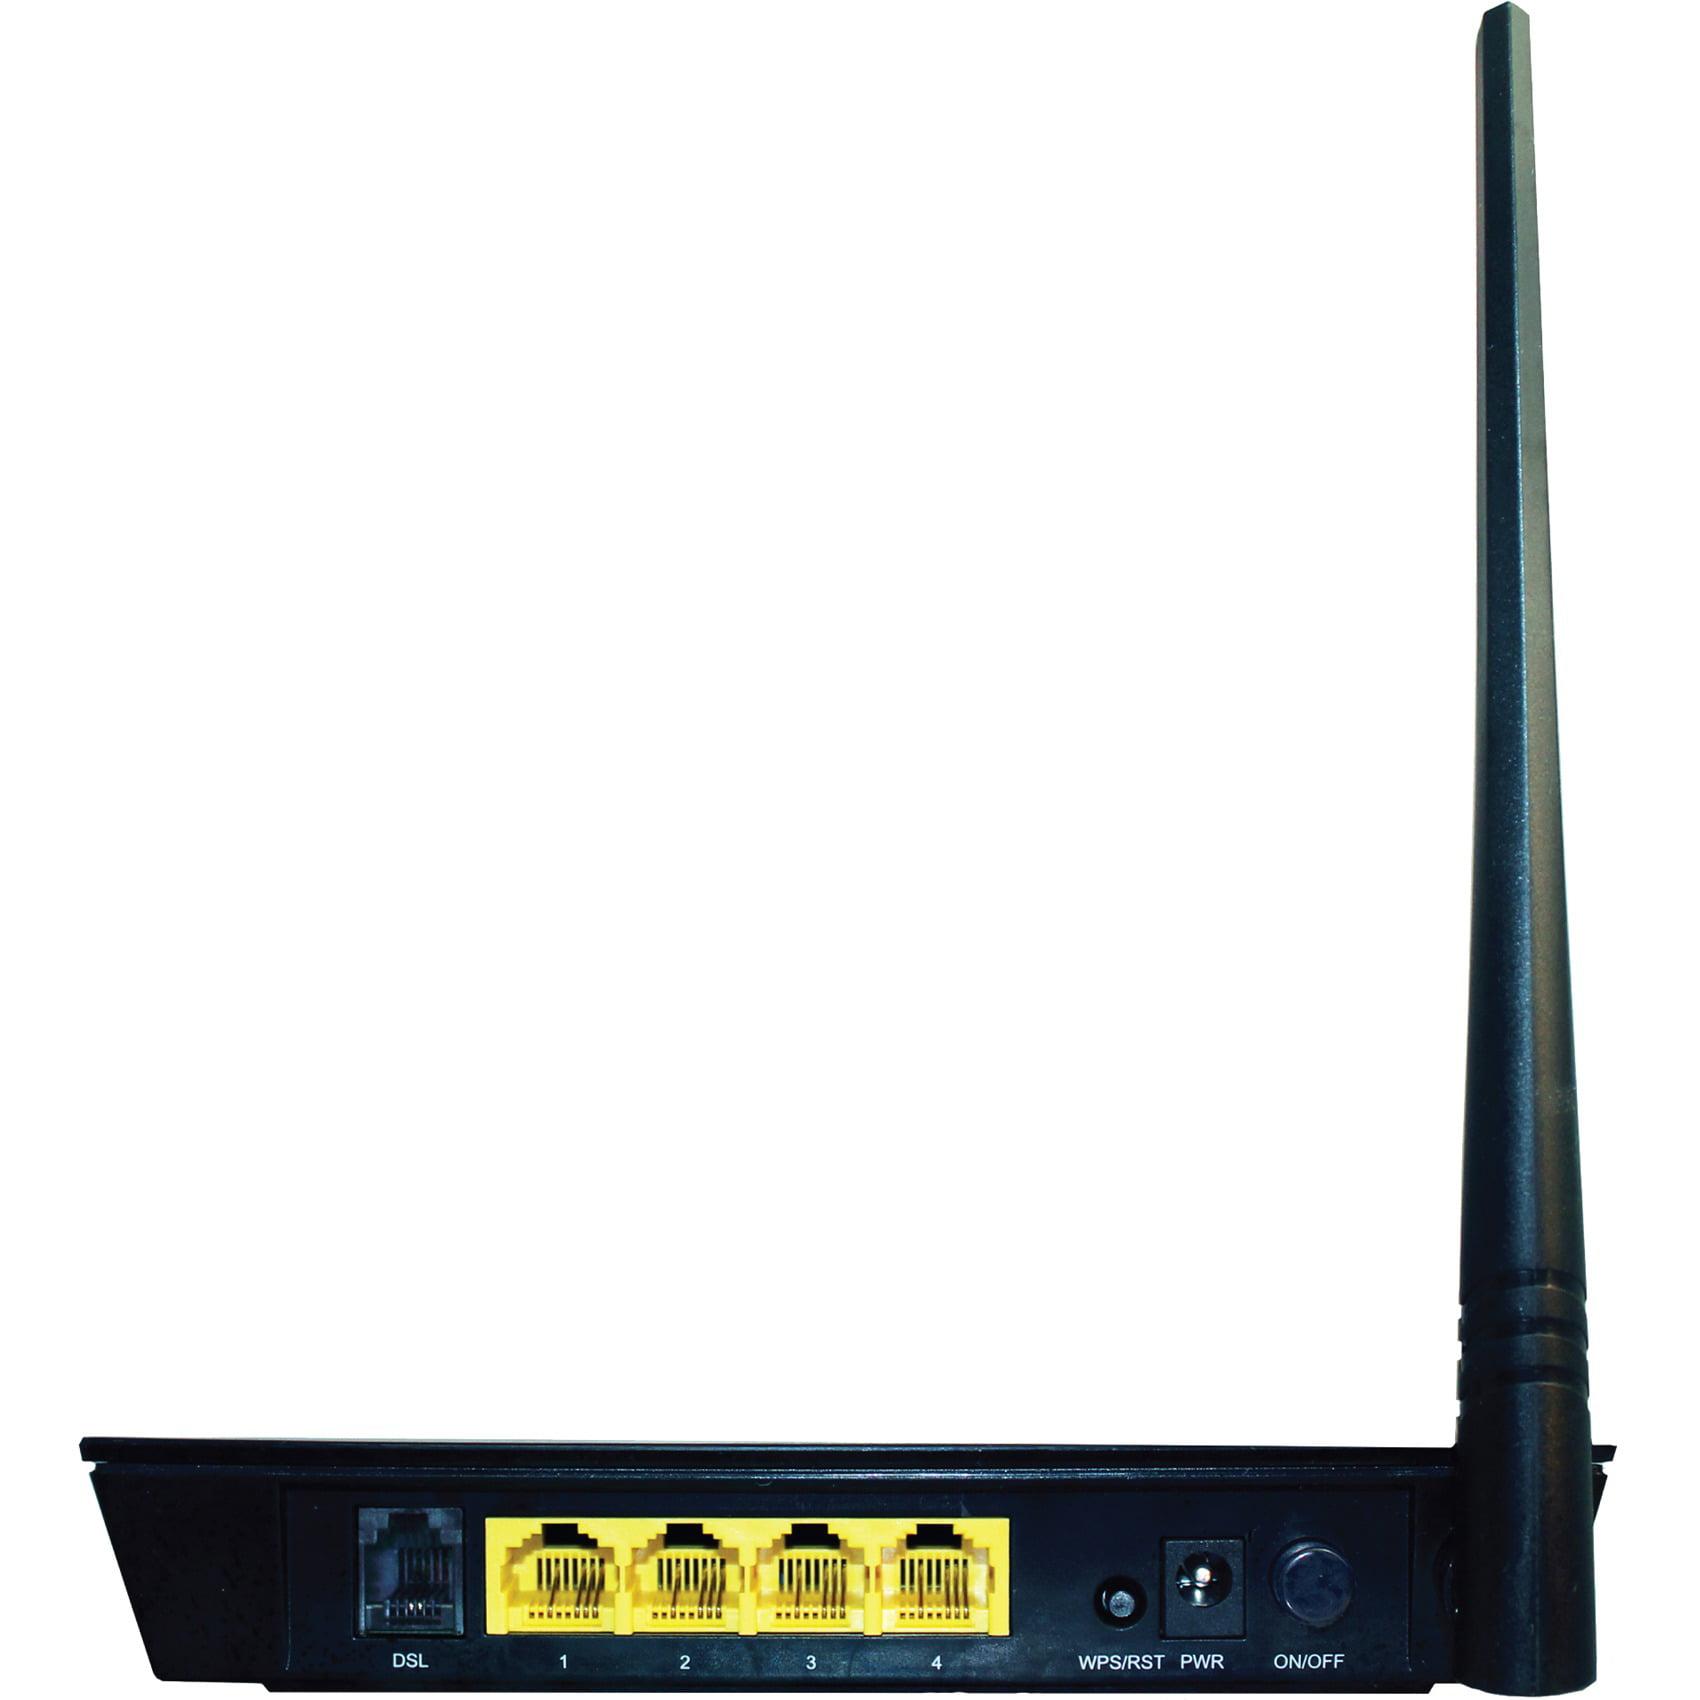 ADSL DSL Modem WiFi Router